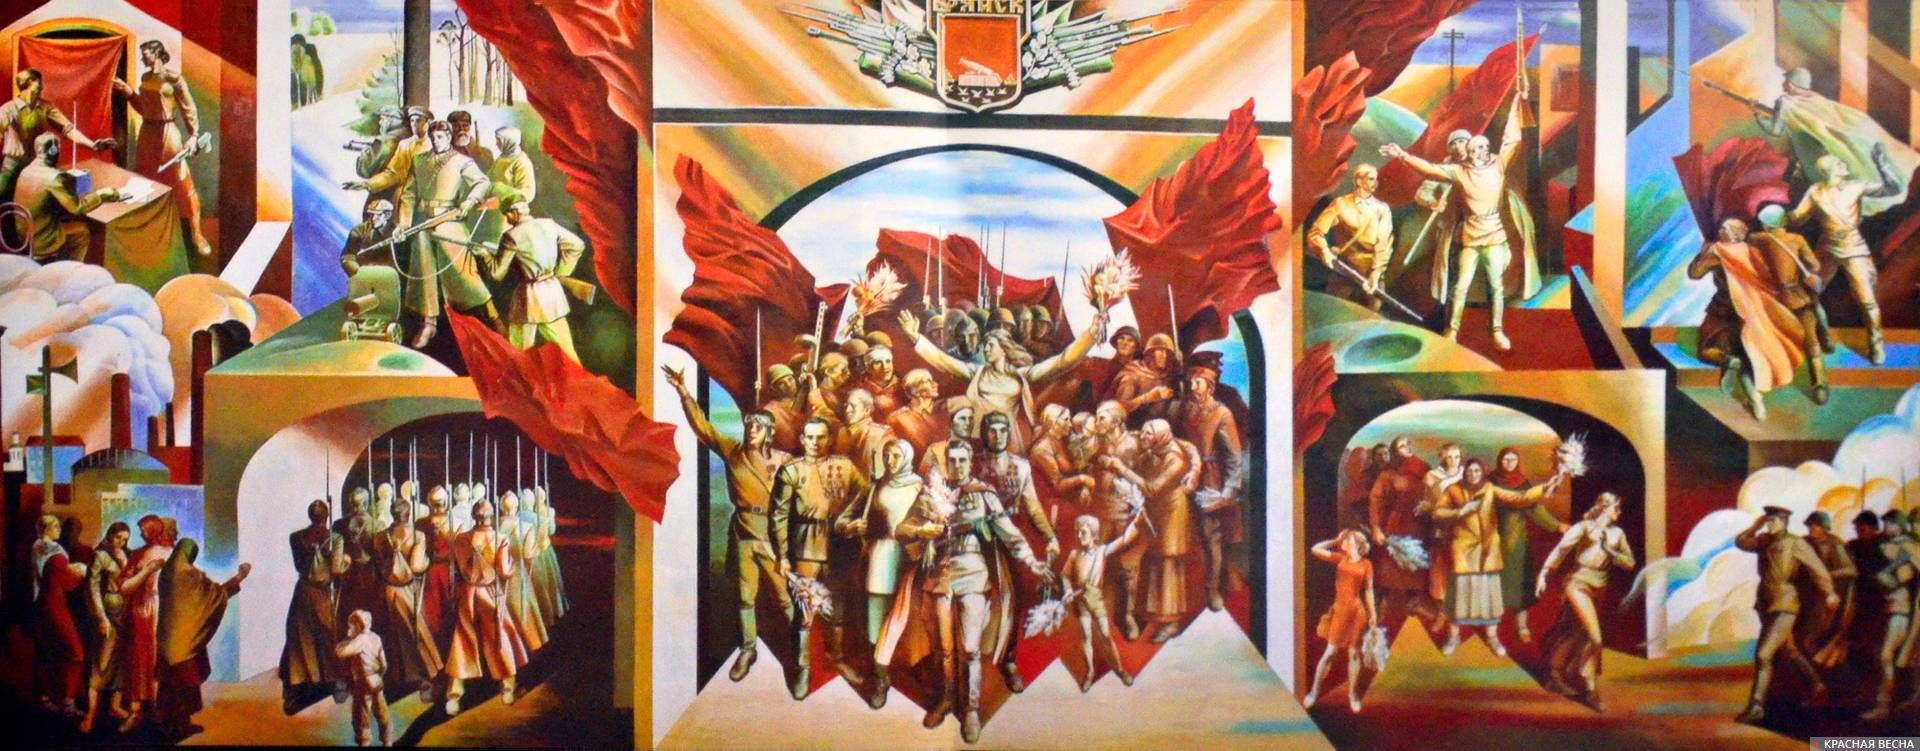 Монументальная роспись «Победа»